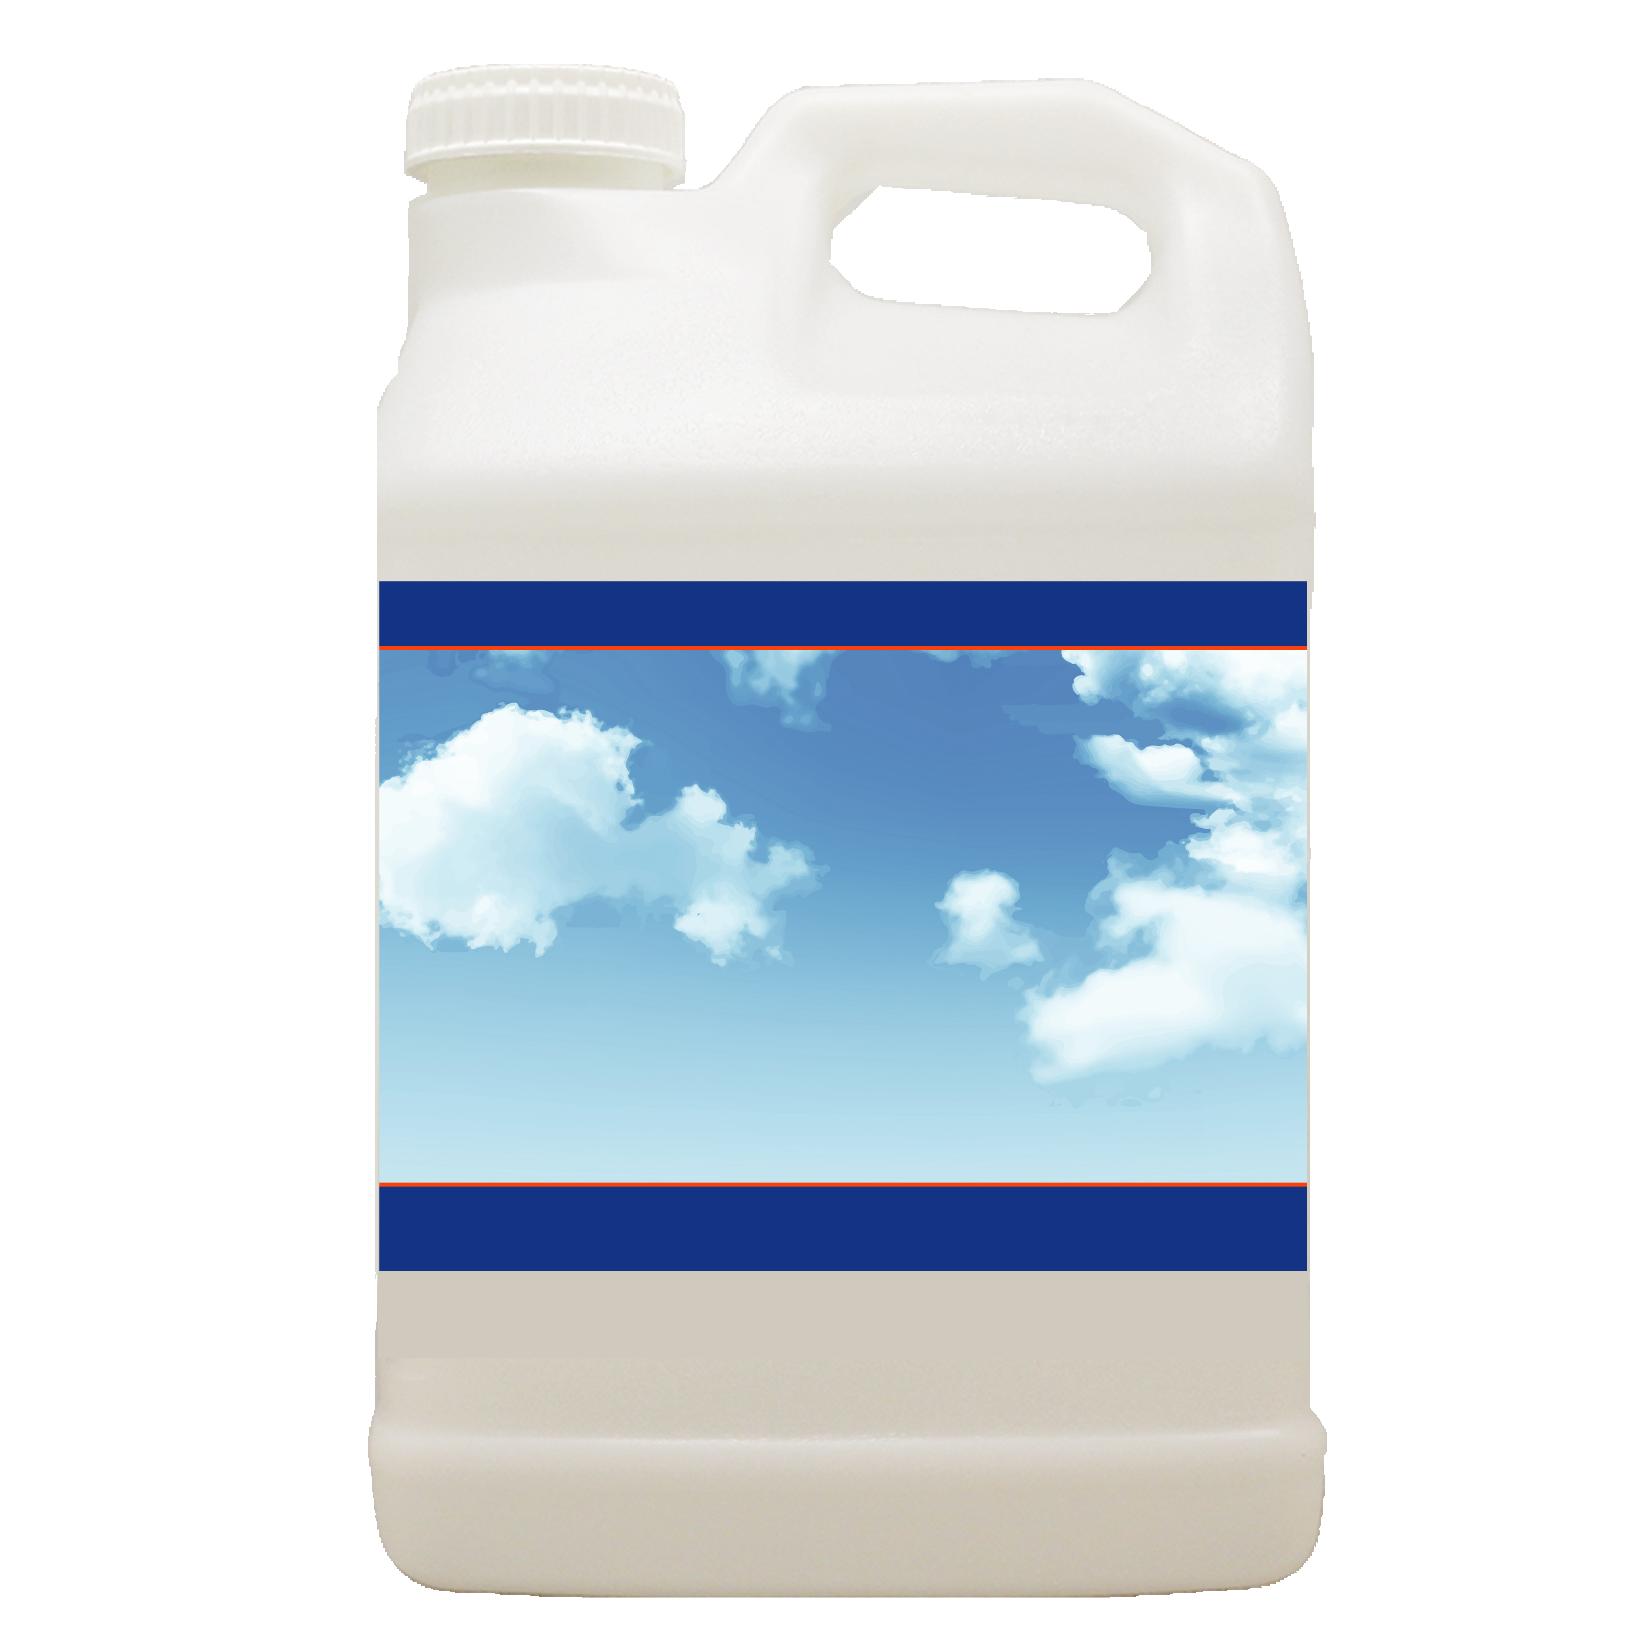 holganix blue sky jug